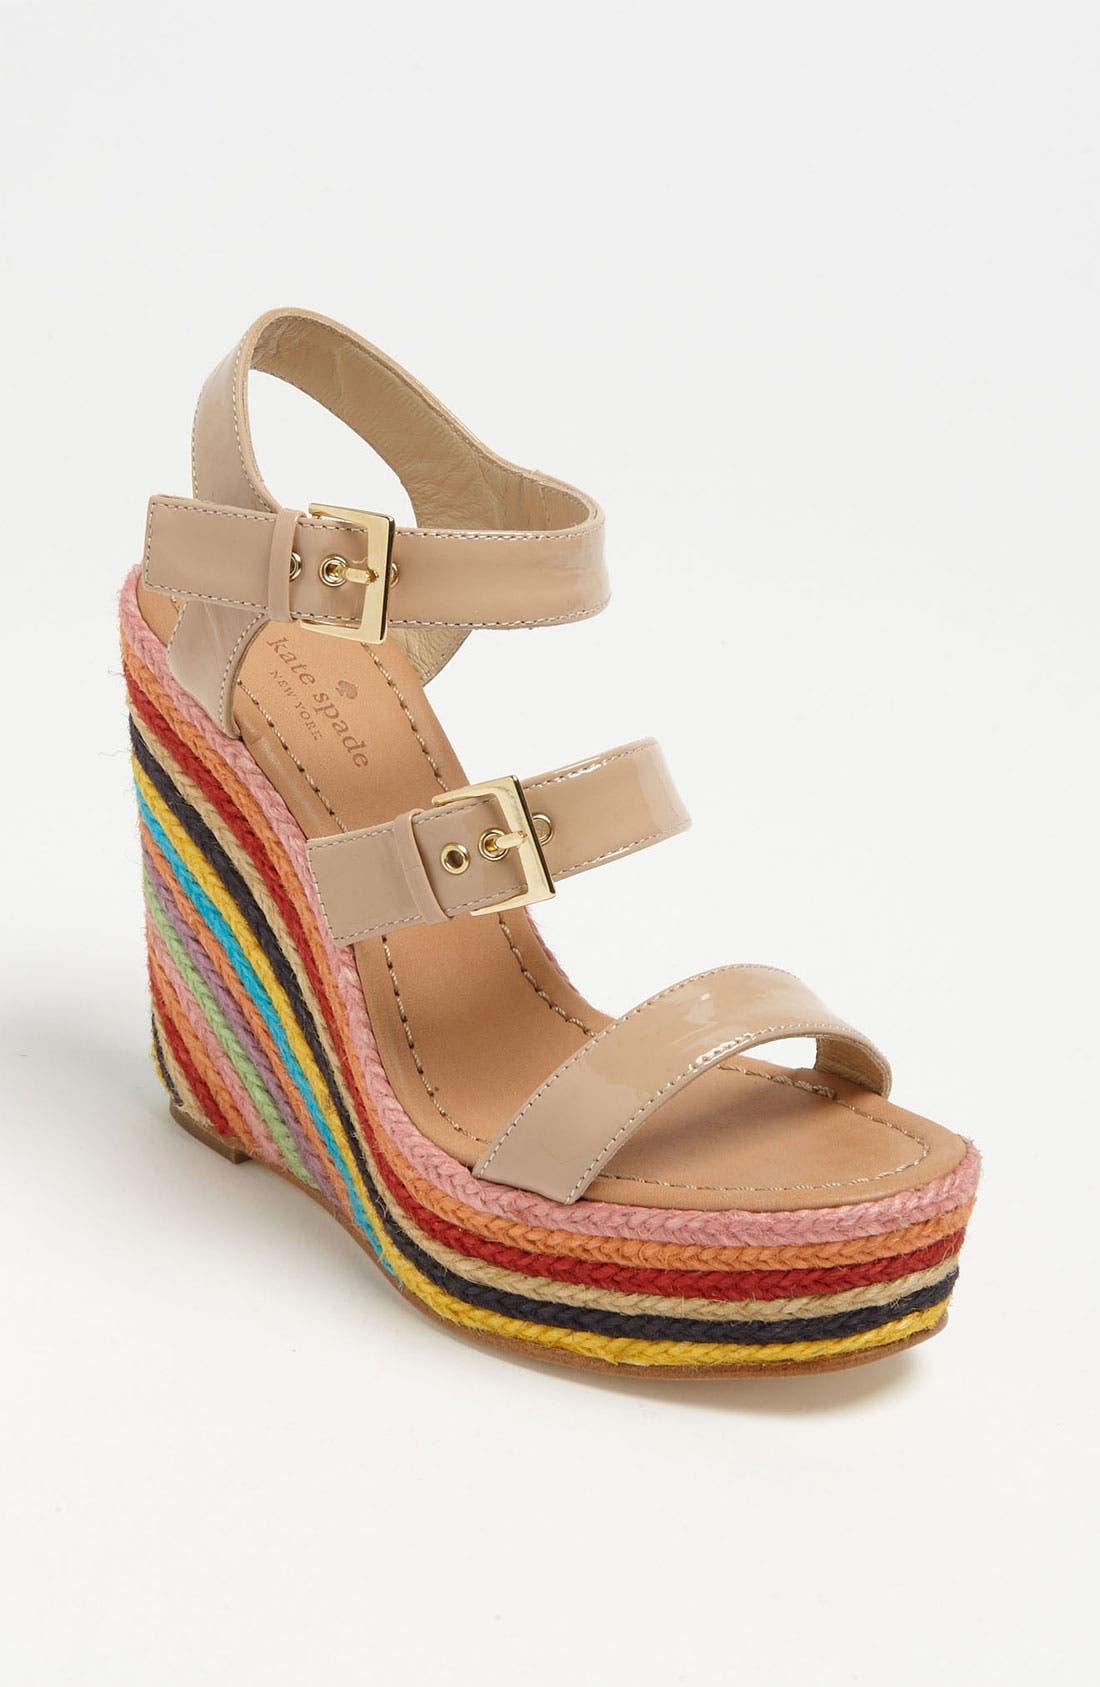 Main Image - kate spade new york 'lucie' espadrille sandal